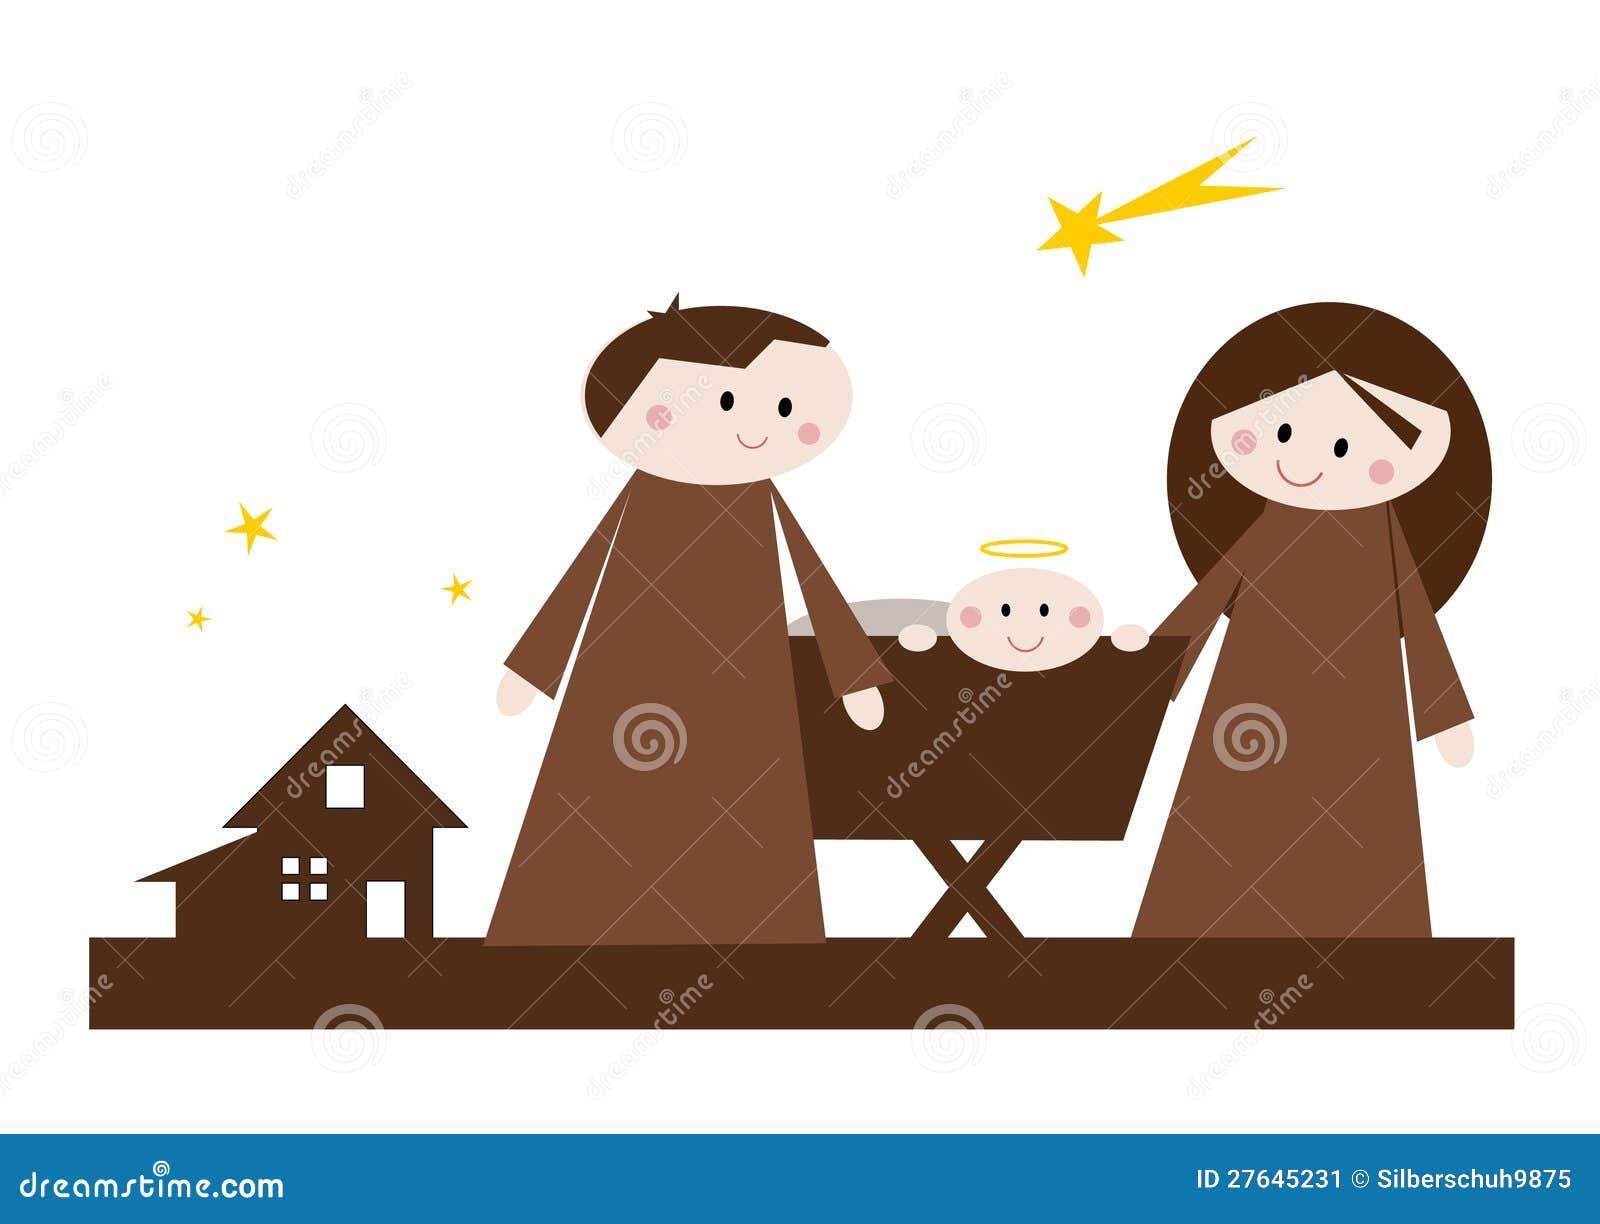 cartoon nativity scene stock image image 27645231 nativity scene clipart for children nativity scene clipart black and white